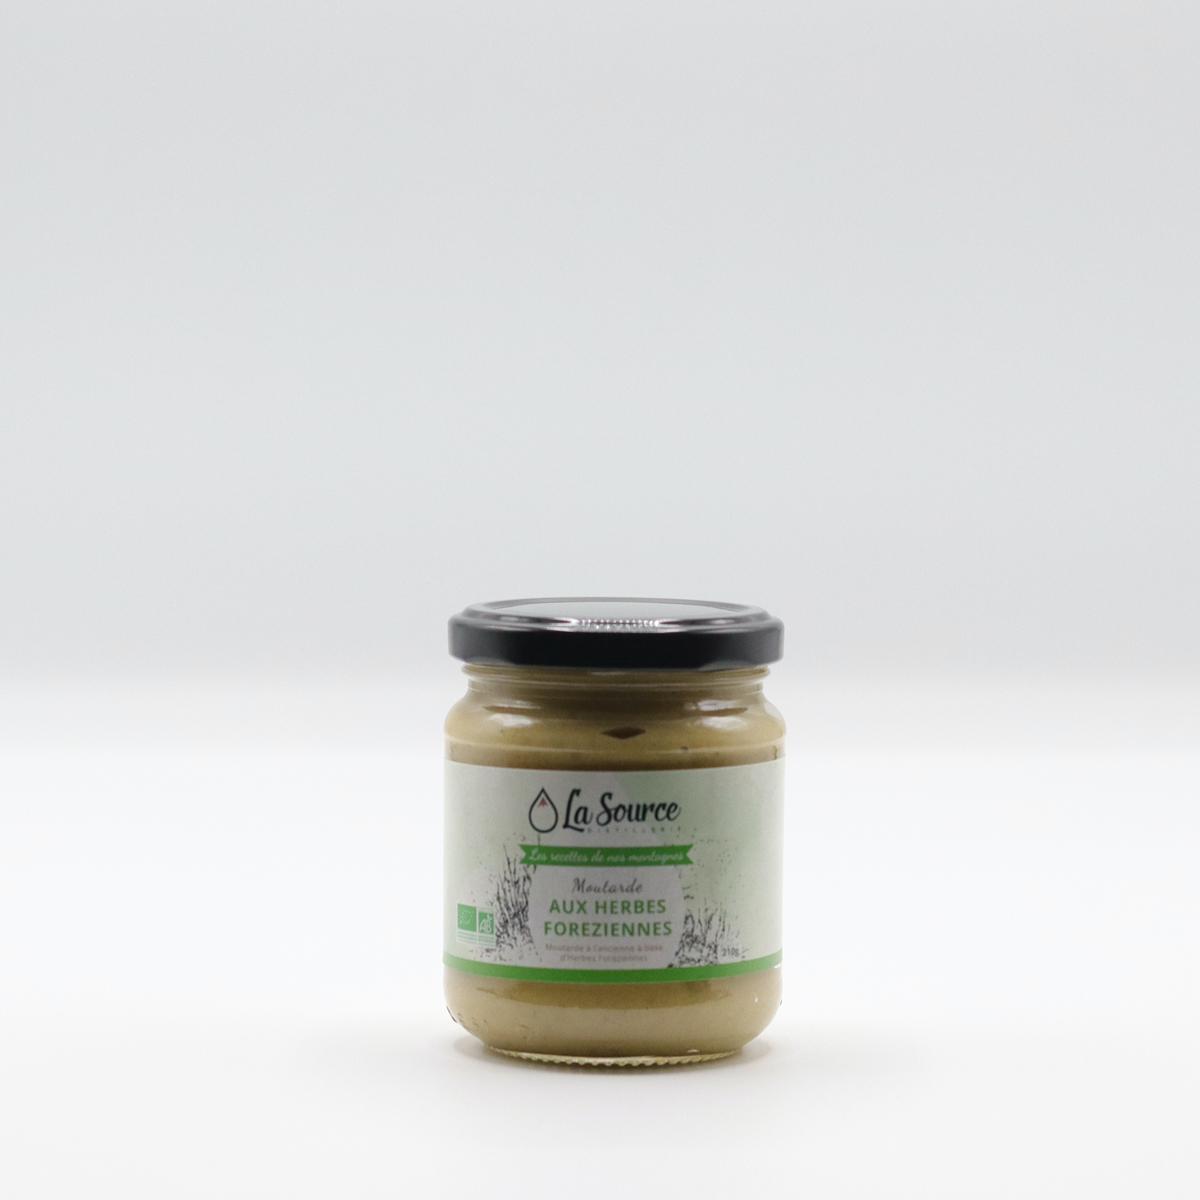 https://www.lasource-distillerie.fr/wp-content/uploads/2021/09/moutarde-herbes-forezienne.jpg